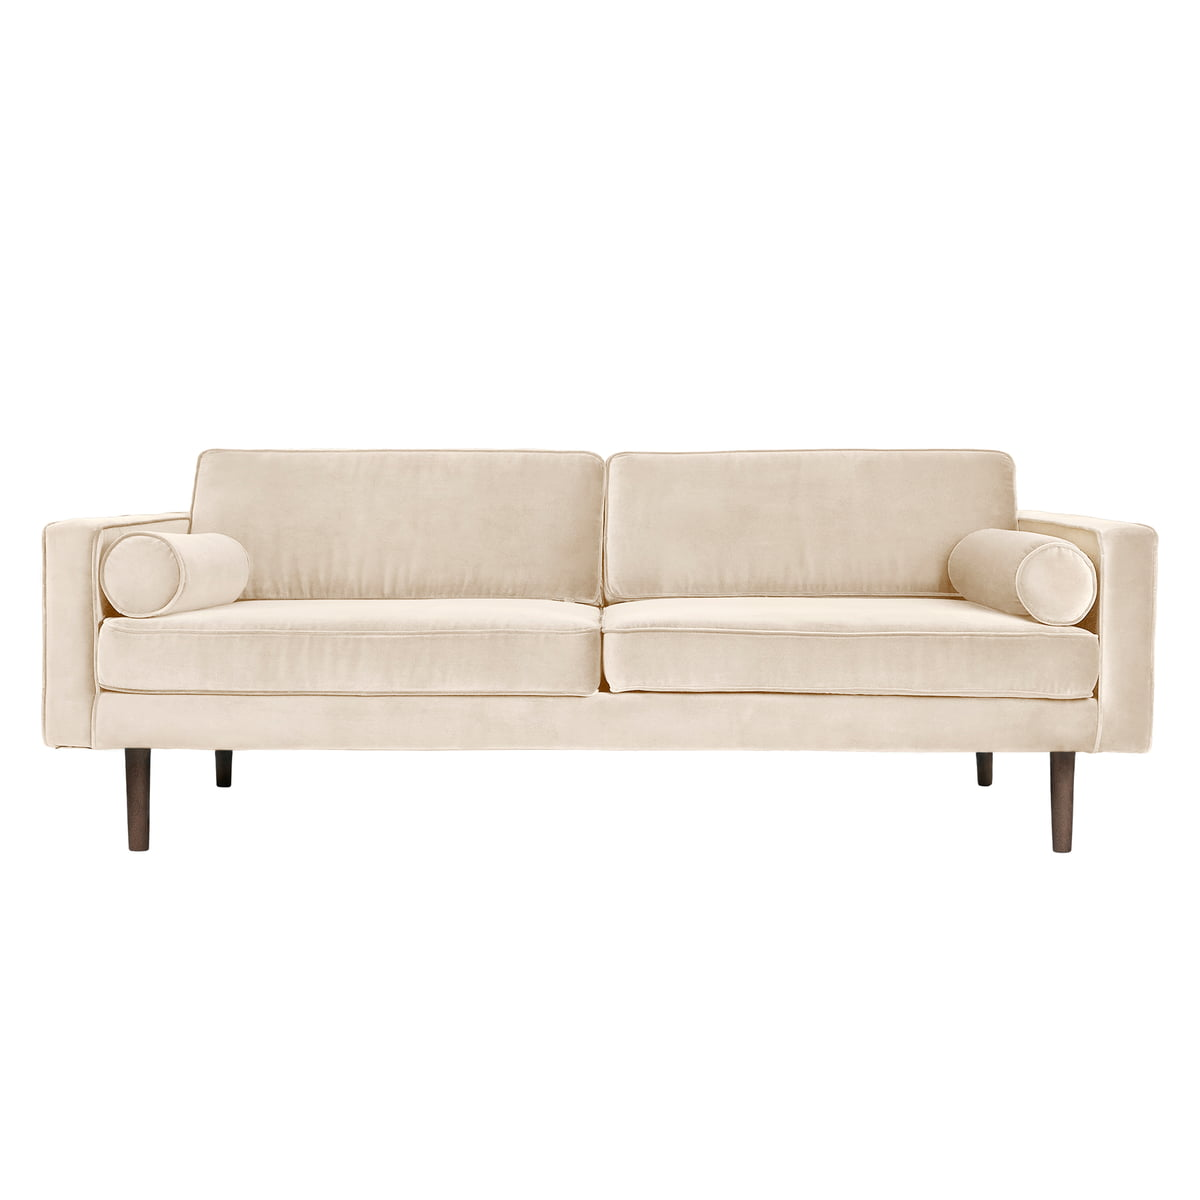 Broste Copenhagen - Wind Sofa L 200 cm, rainy day